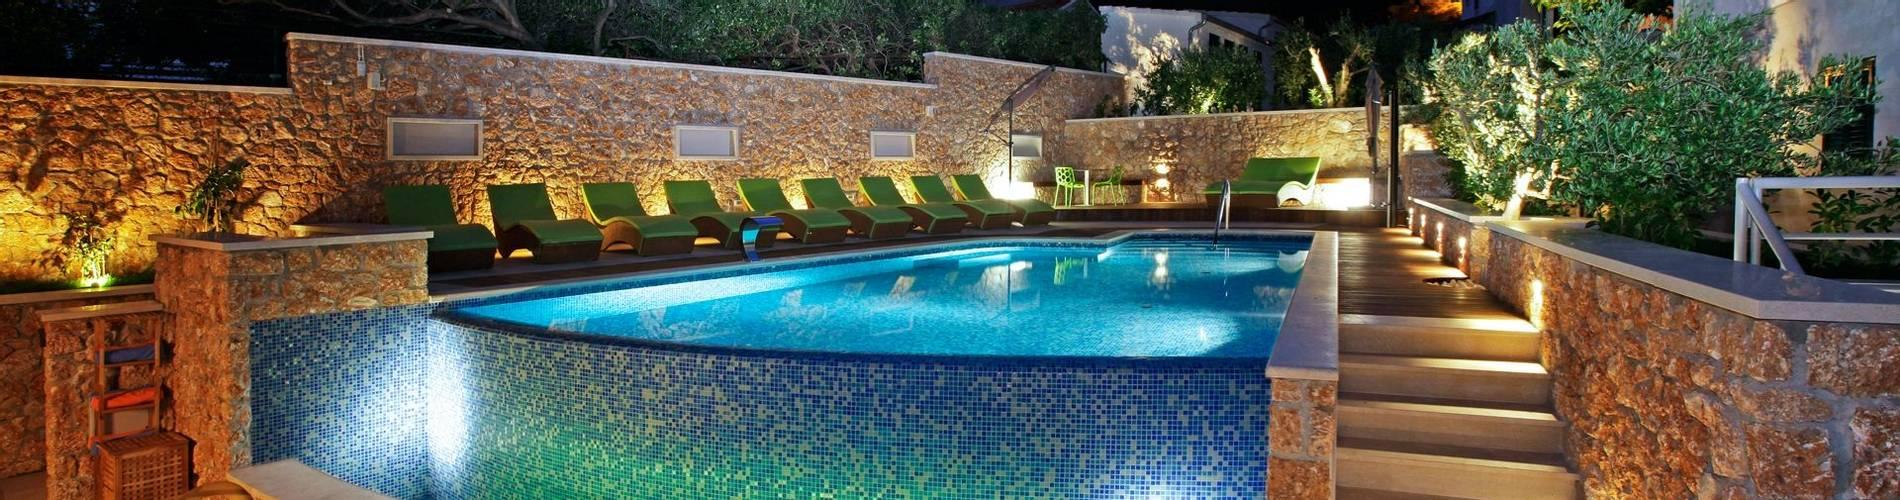 Hotel Bol, Central Dalmatia, Croatia (4).jpg